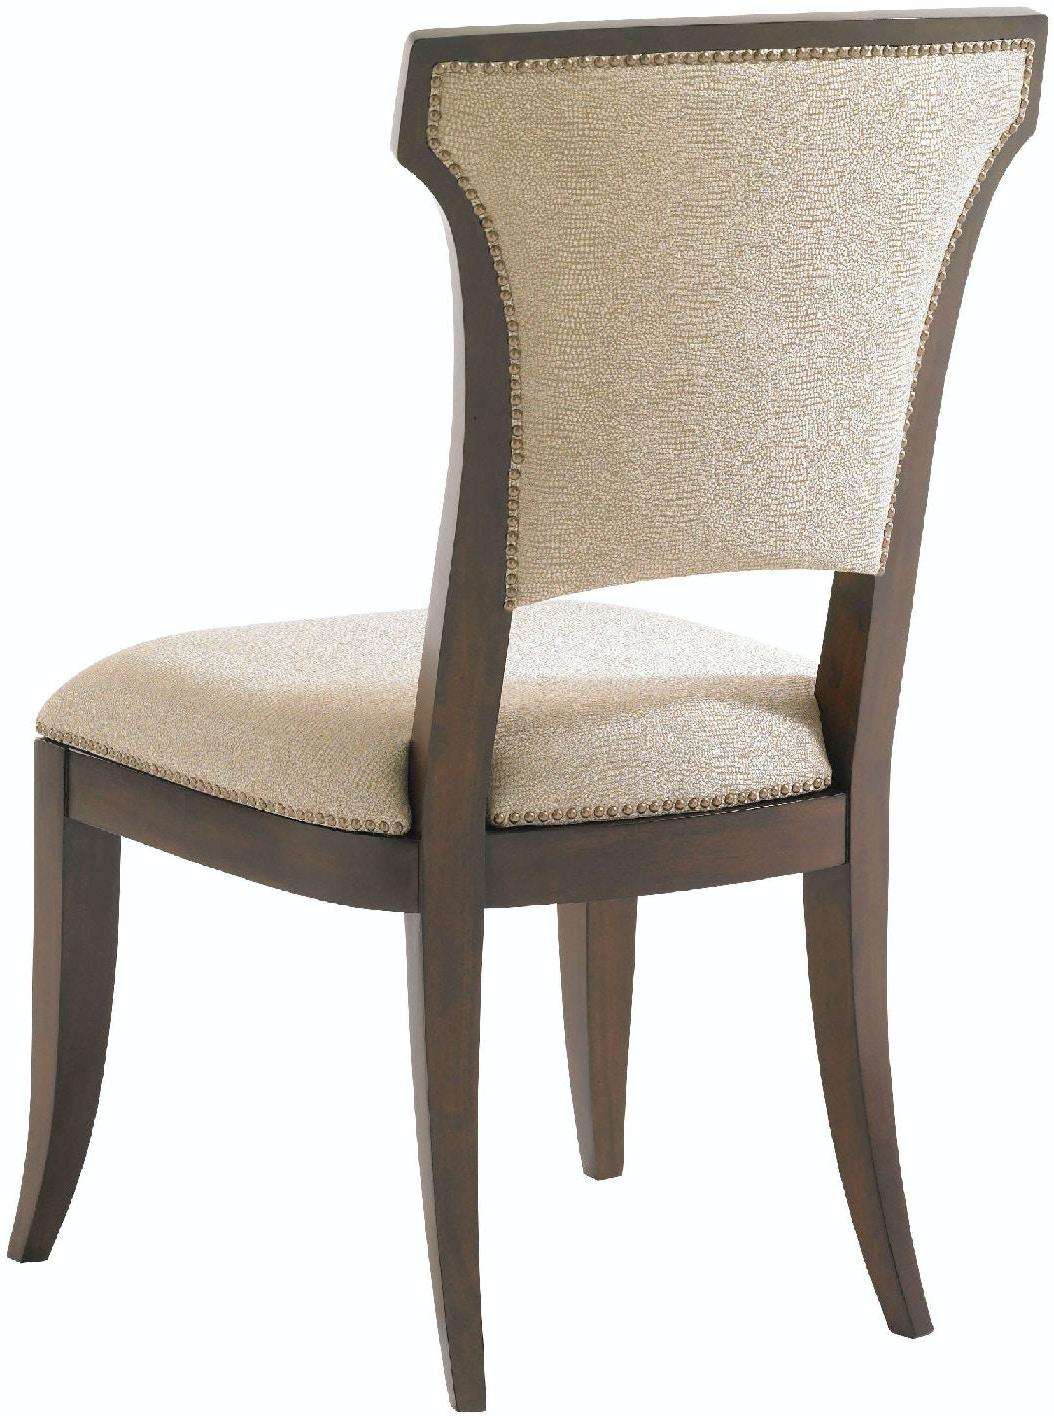 Lexington Dining Room Seneca Upholstered Side Chair 706